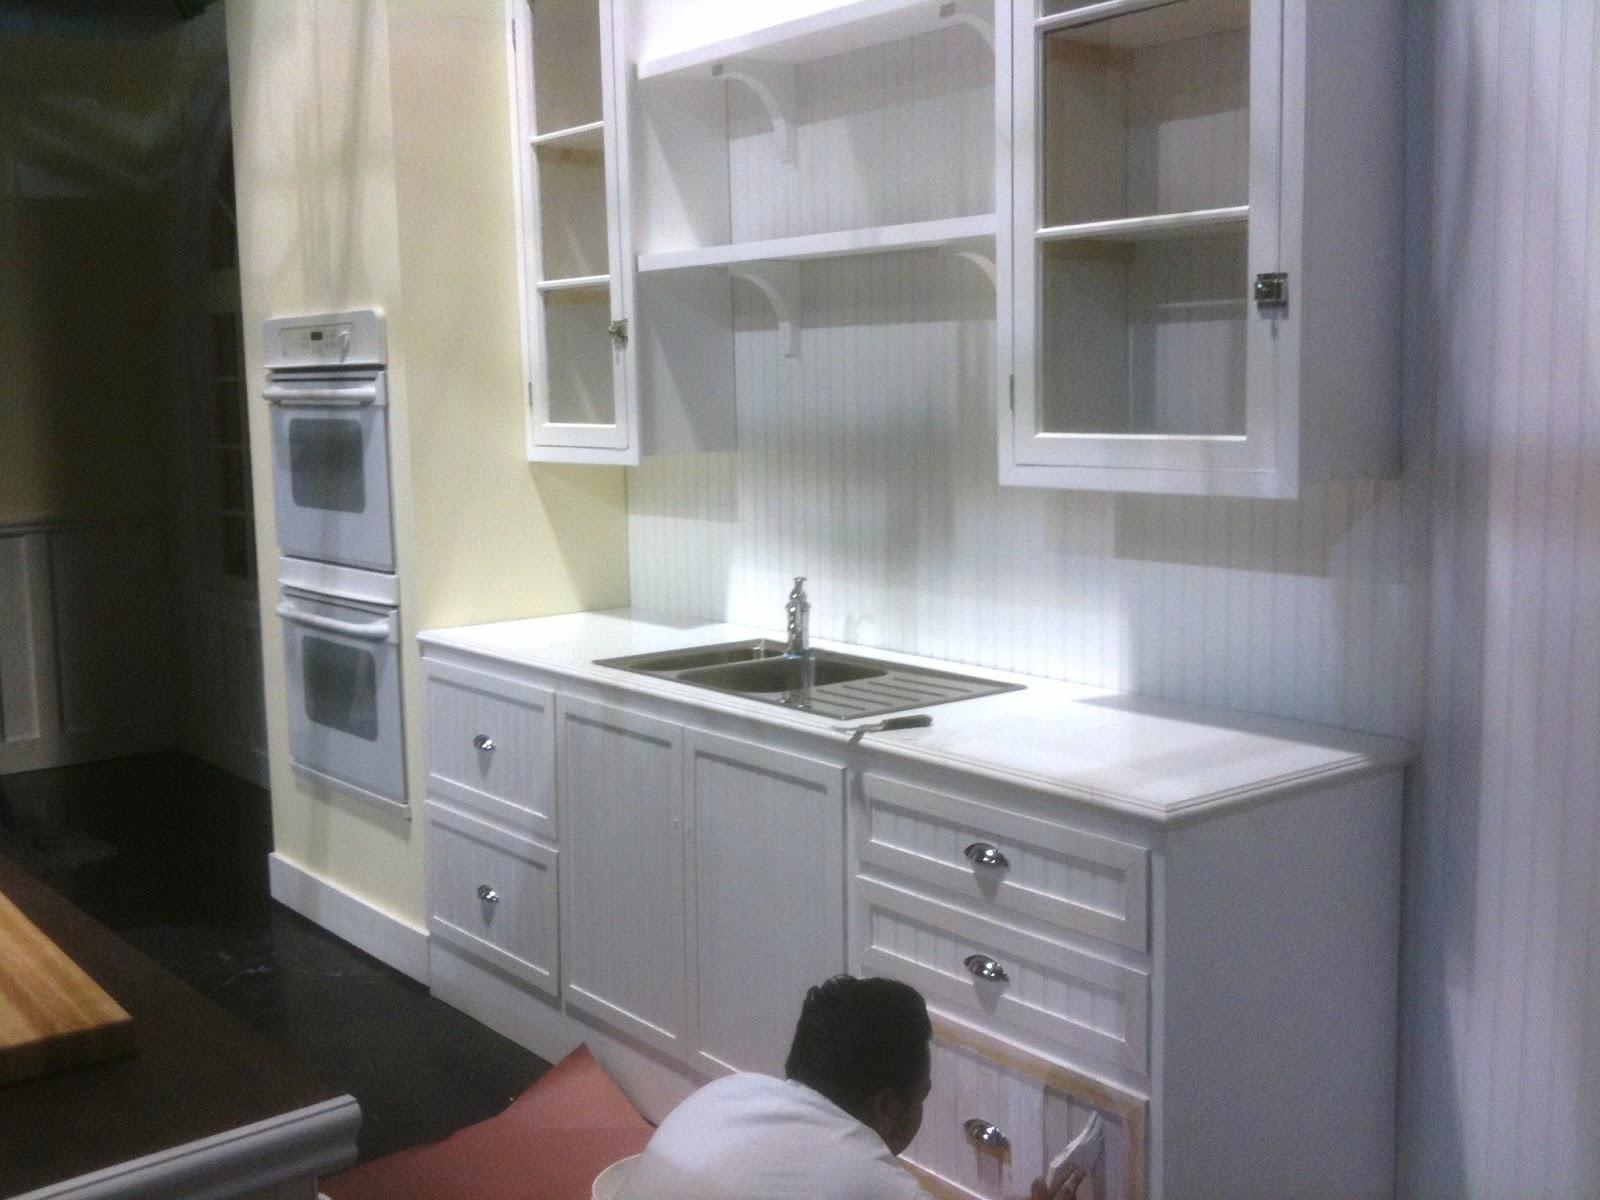 Thb construction tv studio set kitchen set created for for Kitchen set 008 58